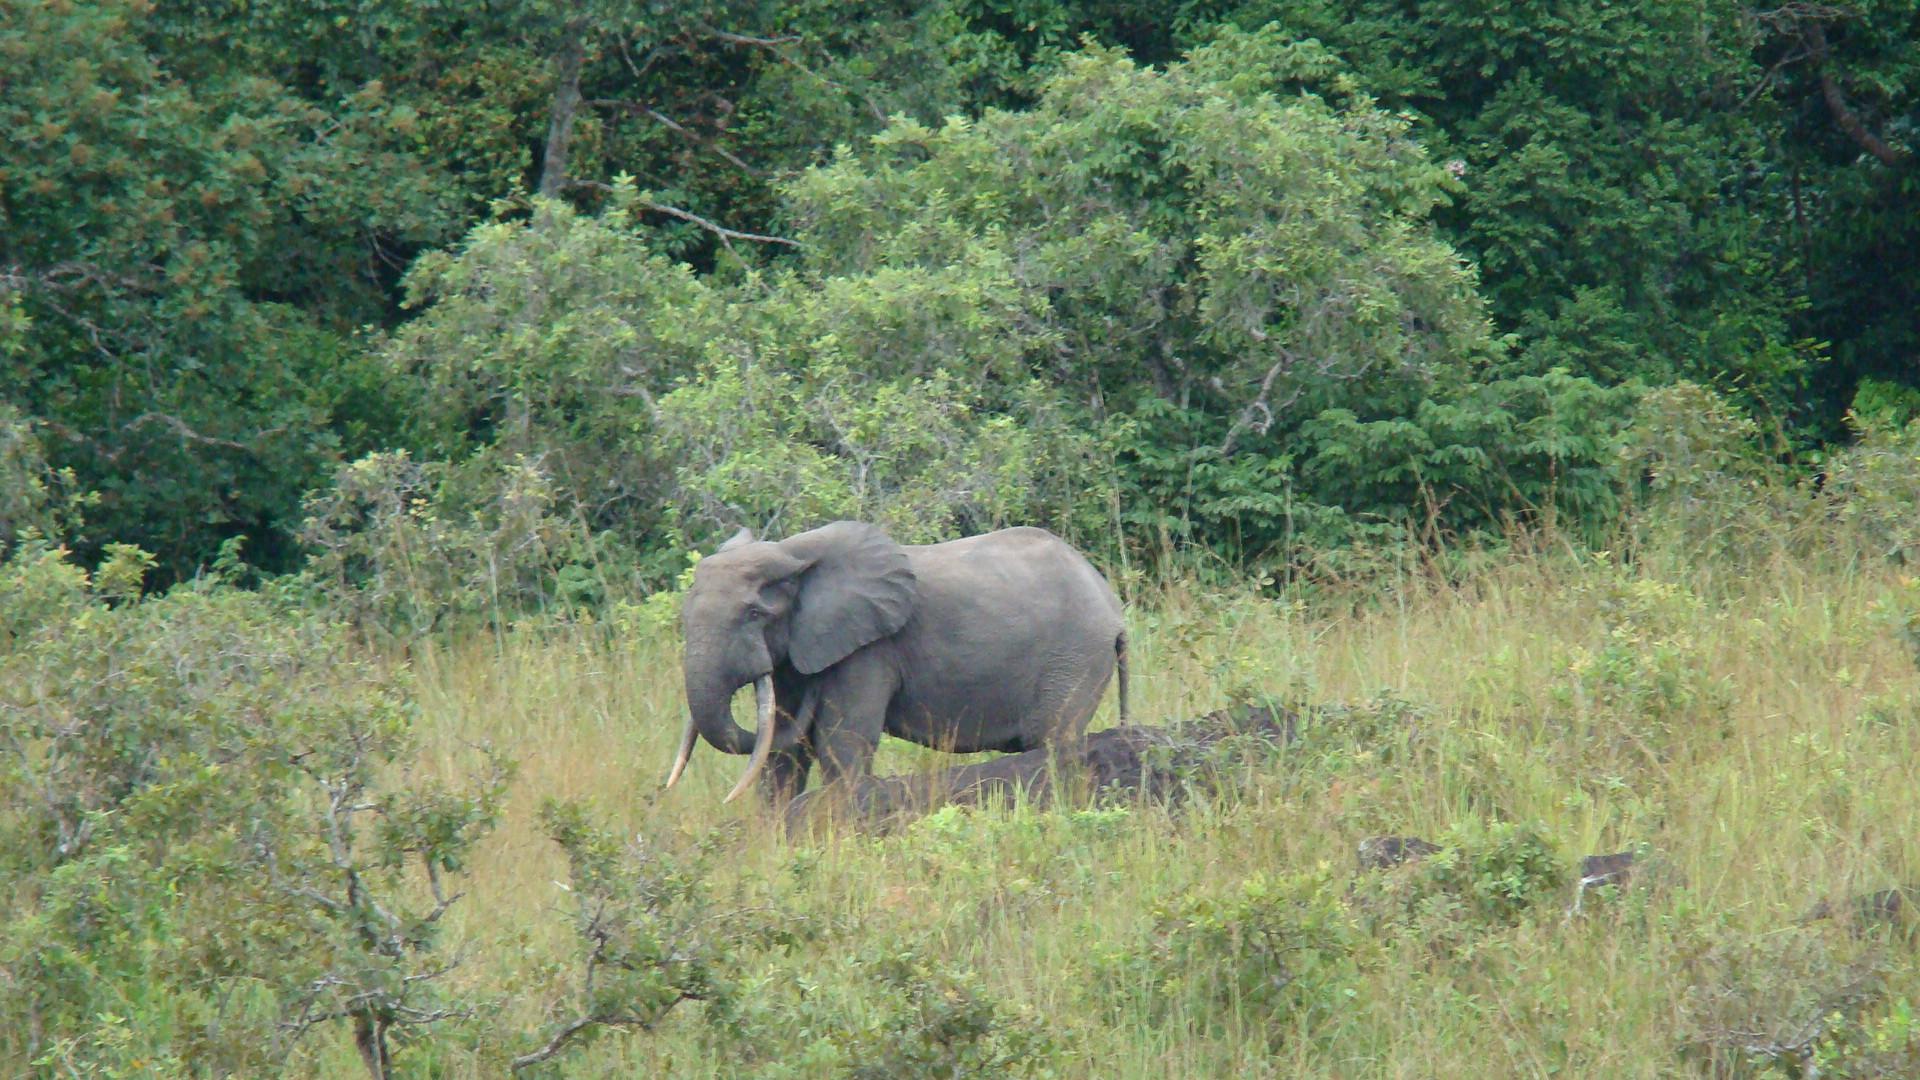 Forest elephant ear